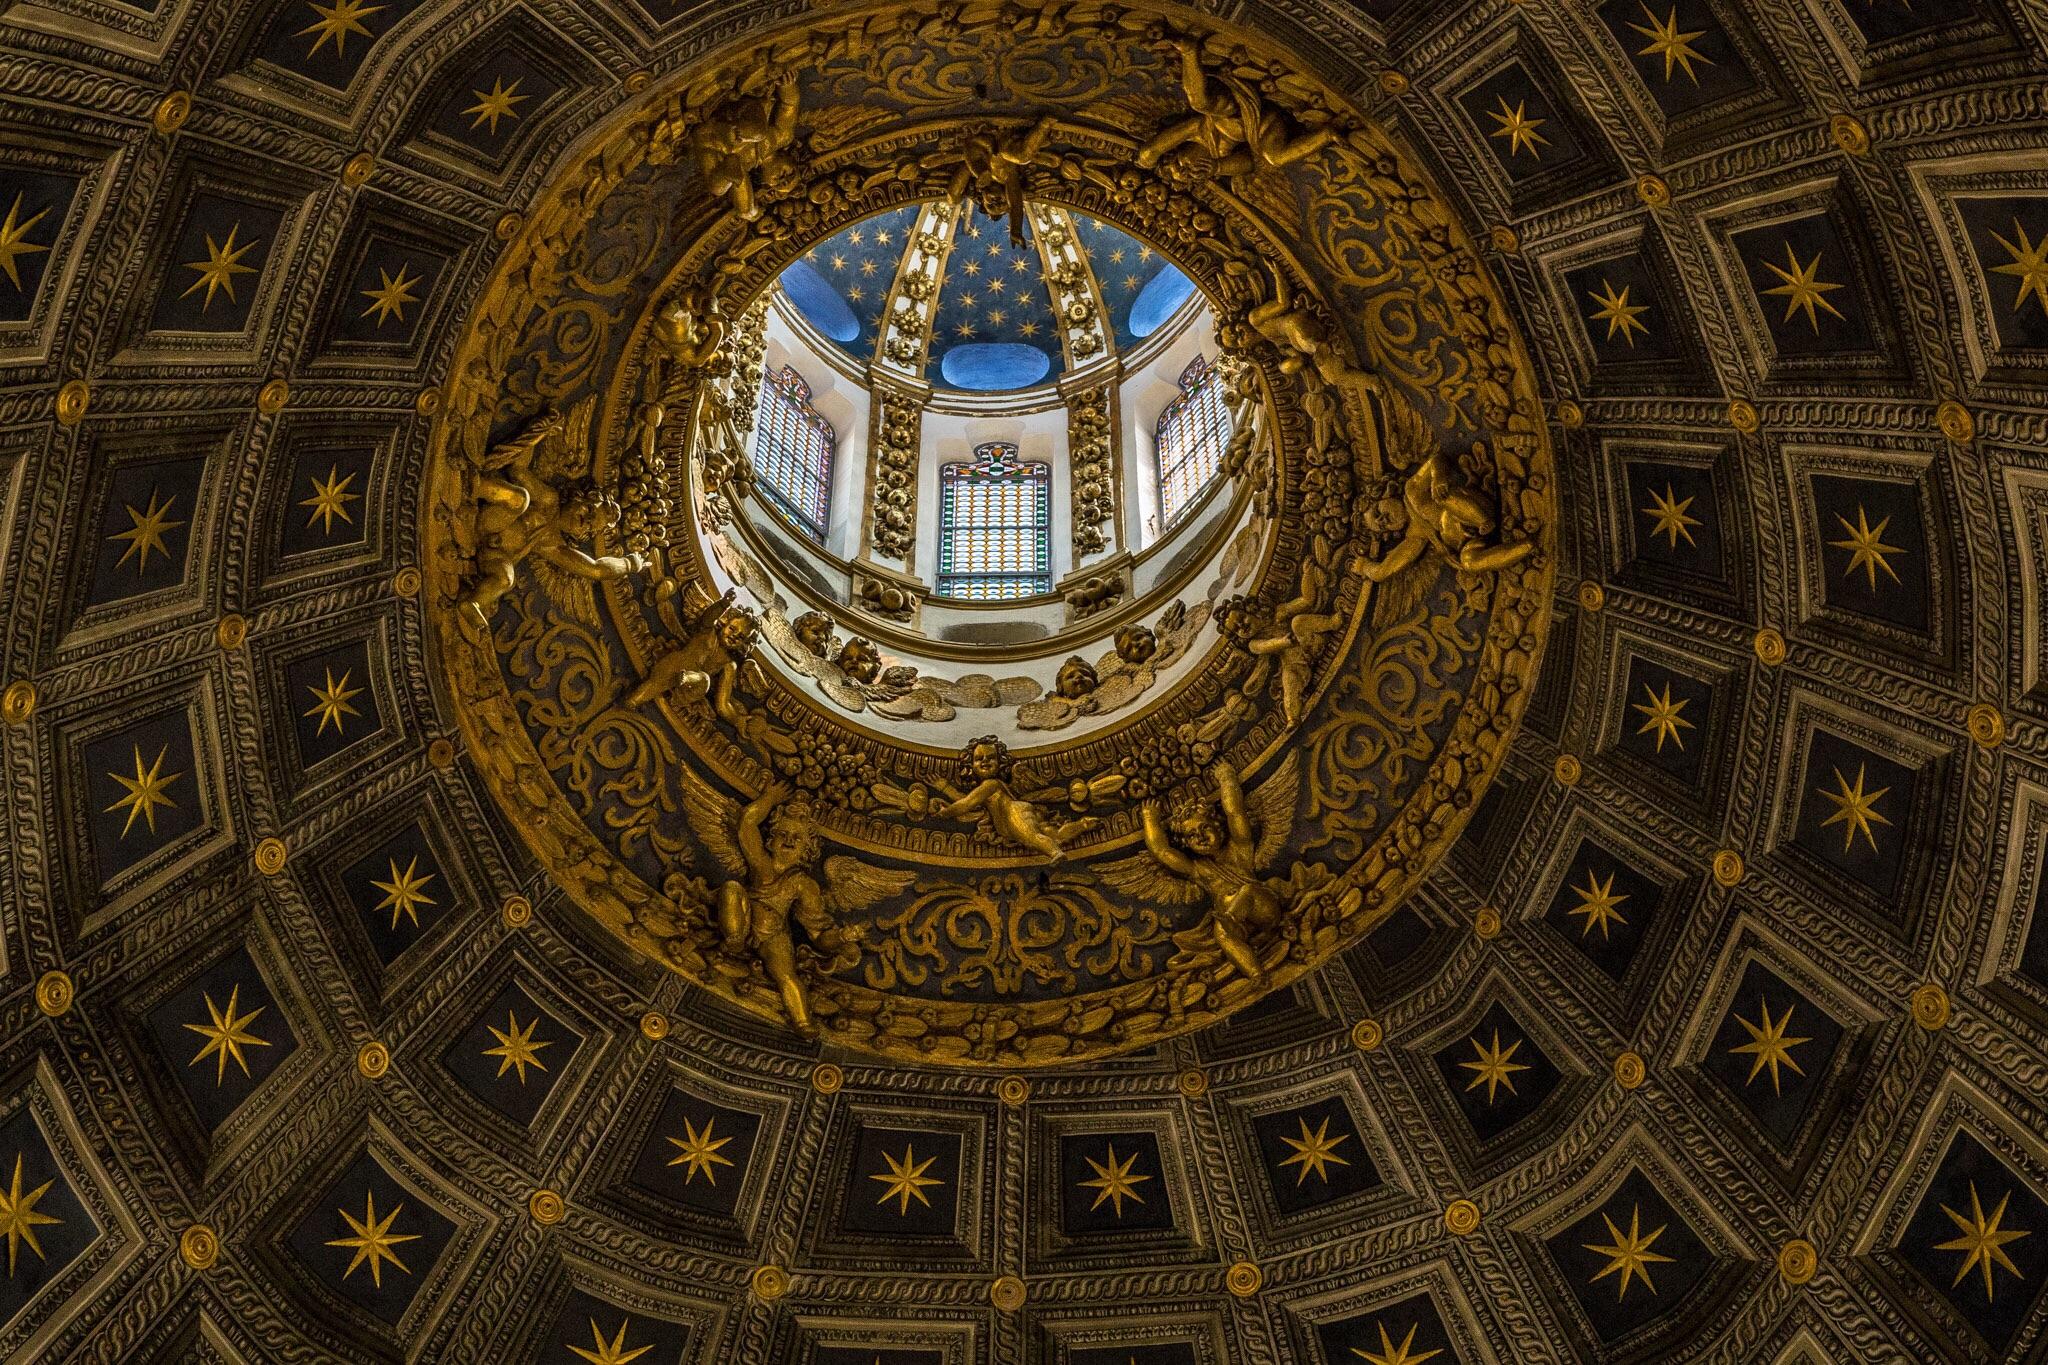 Interior photography by Rick McEvoy